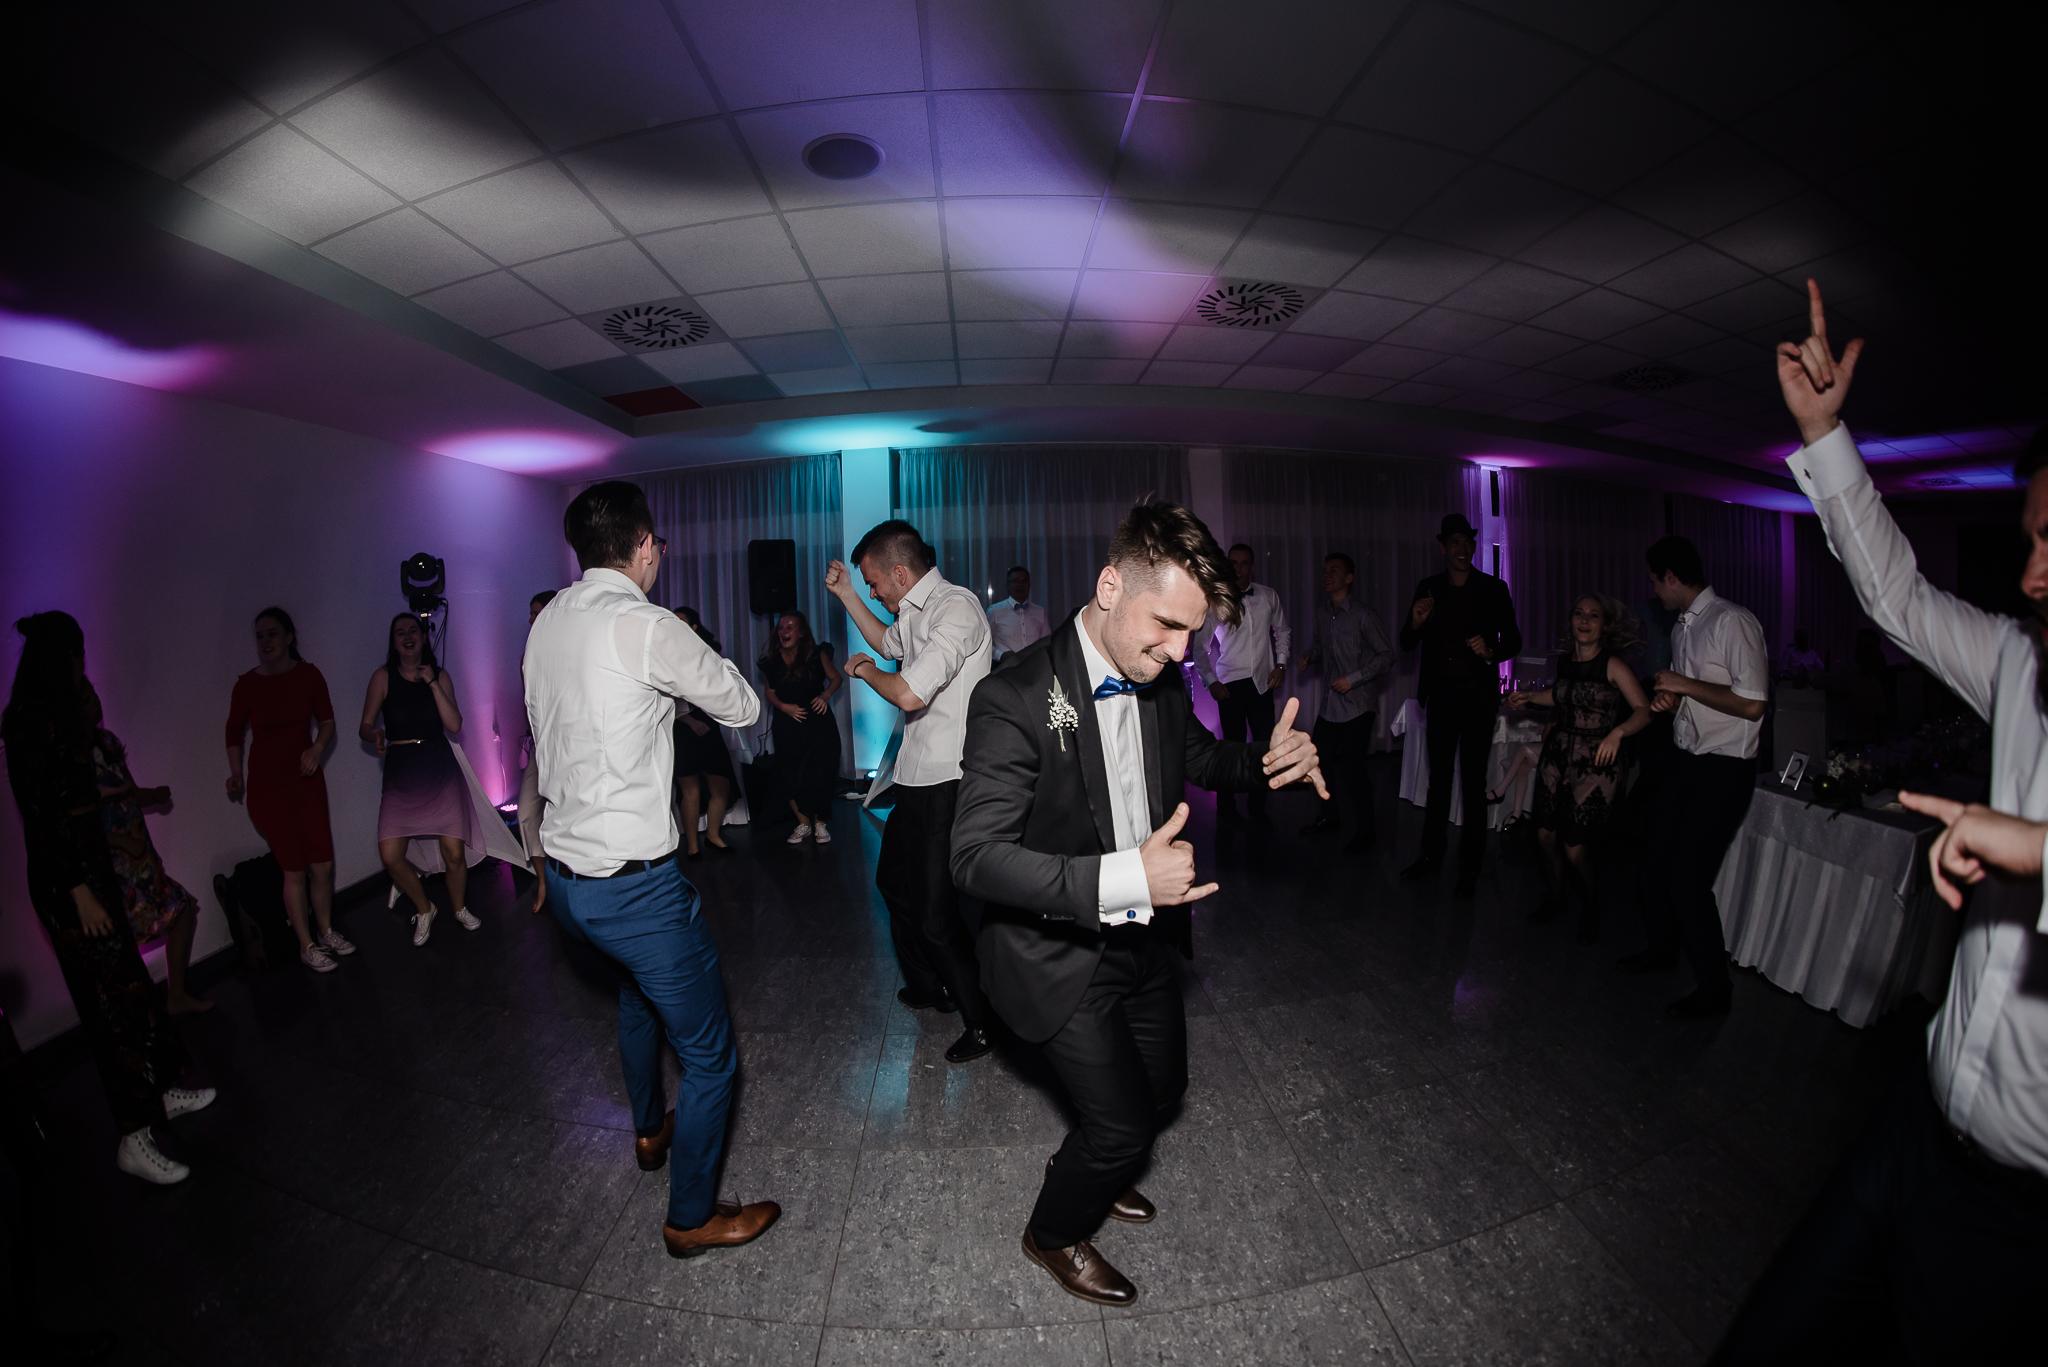 Svadba Pata, Kulturák u Palušáka 04 #svadobnyDJ, #djanasvadbu, #svadba, #svadbapata, #Pata #DJAnavi